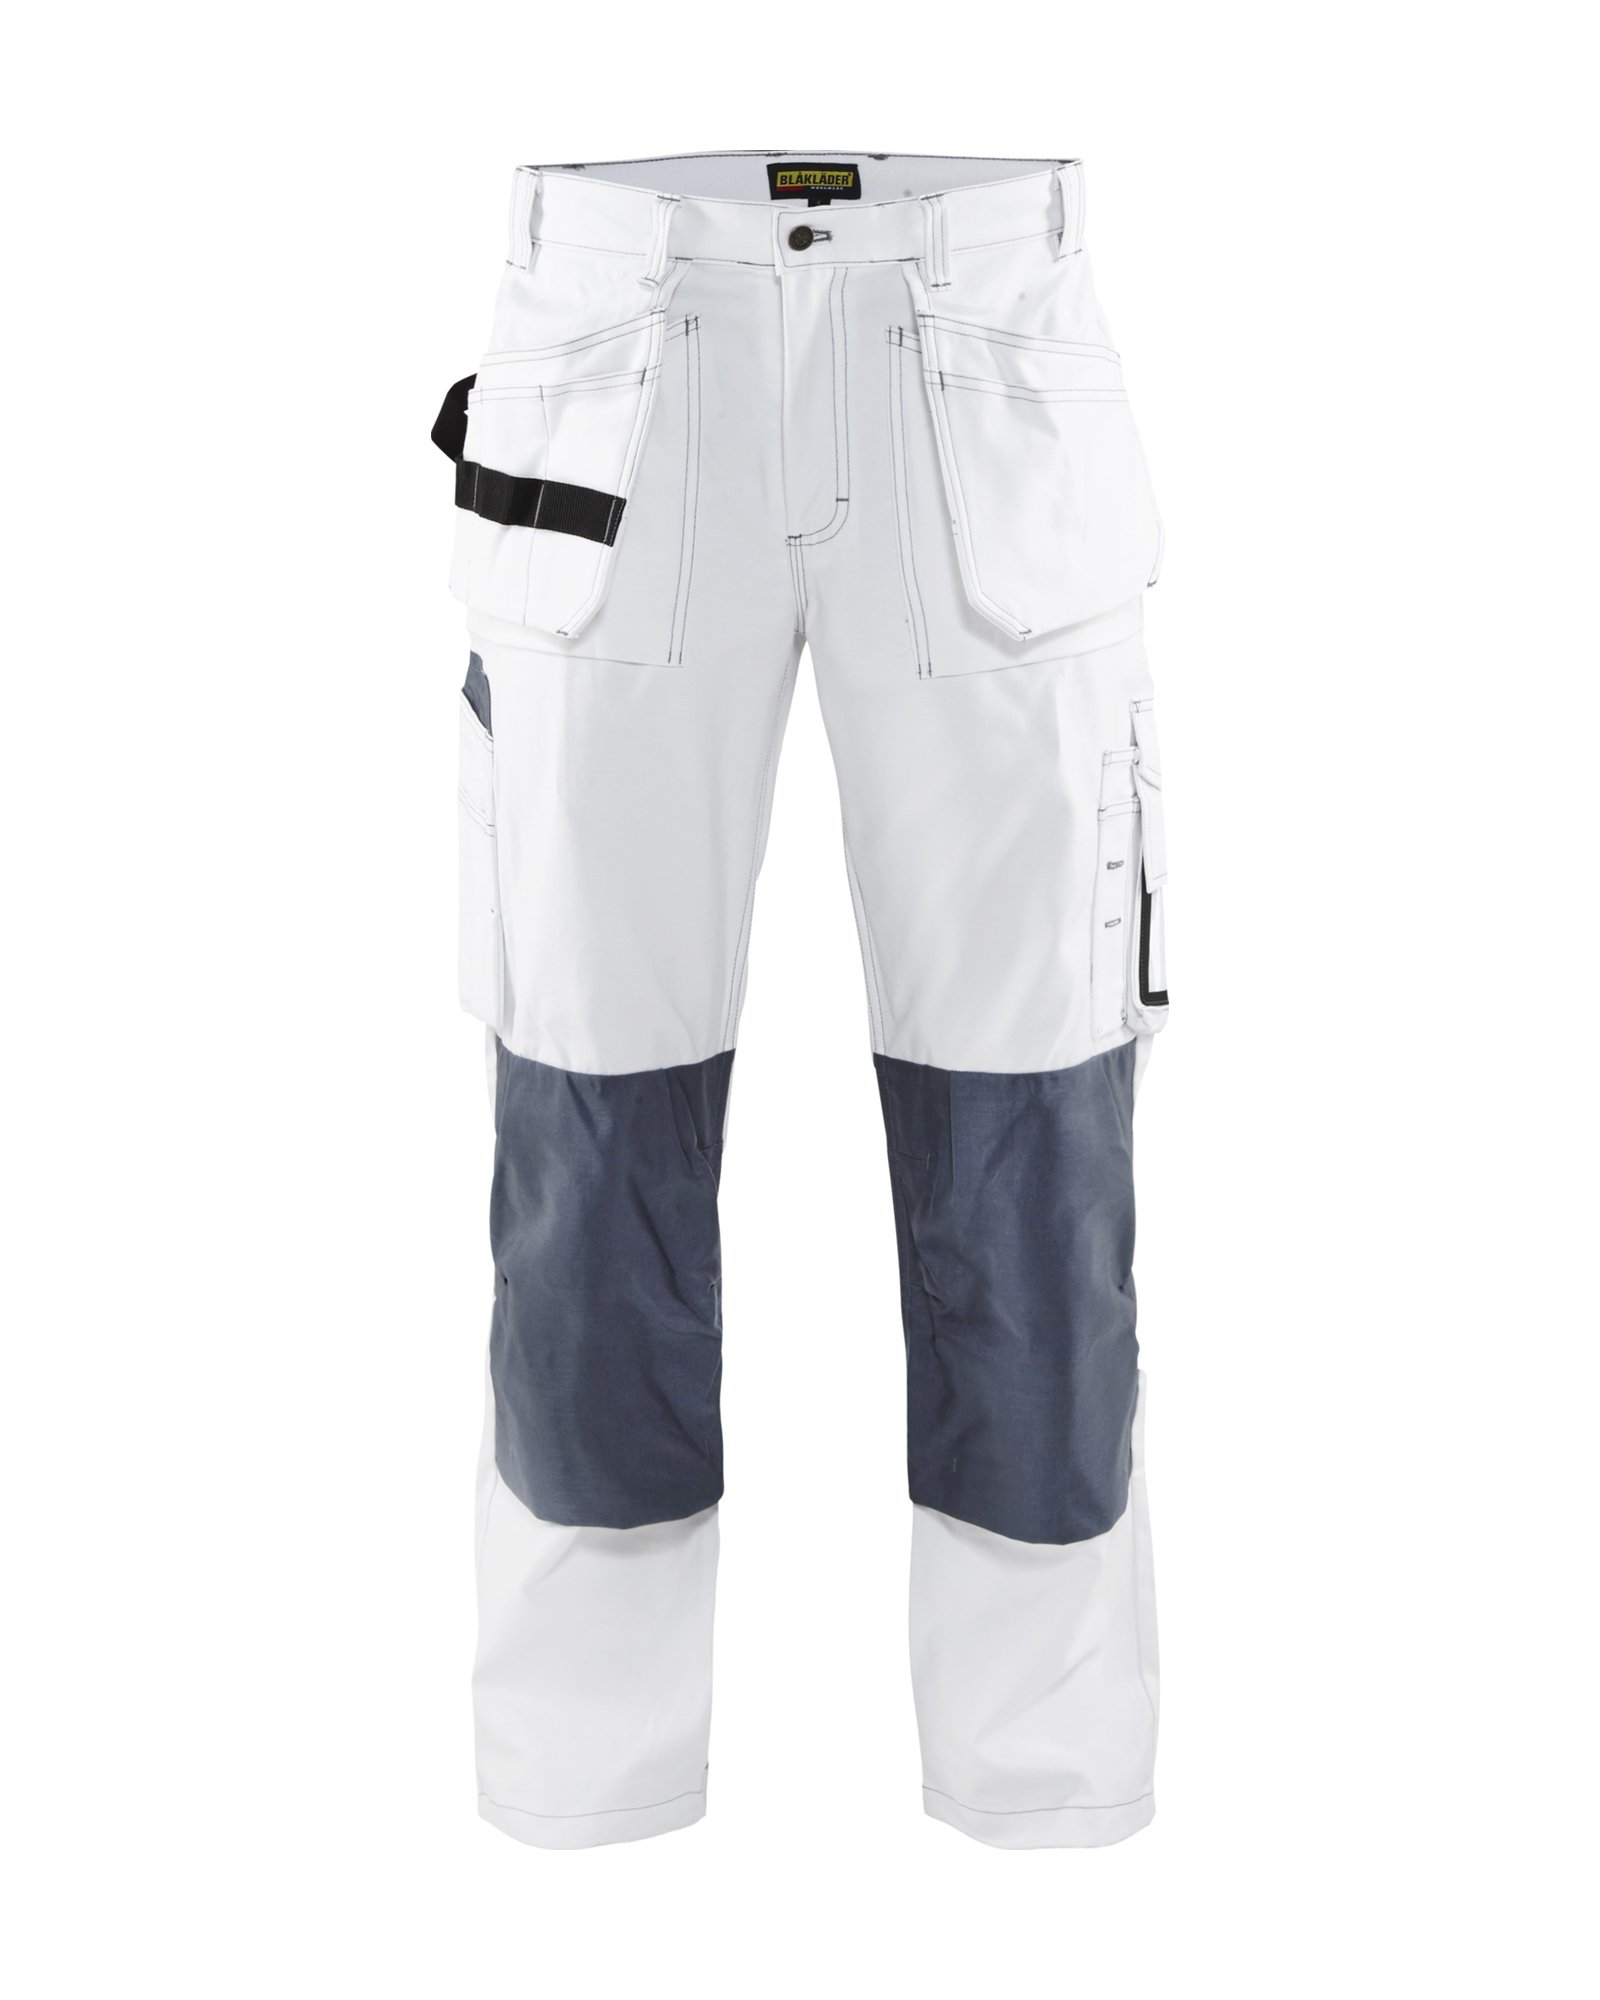 Blaklader Painter Pants White 42 30